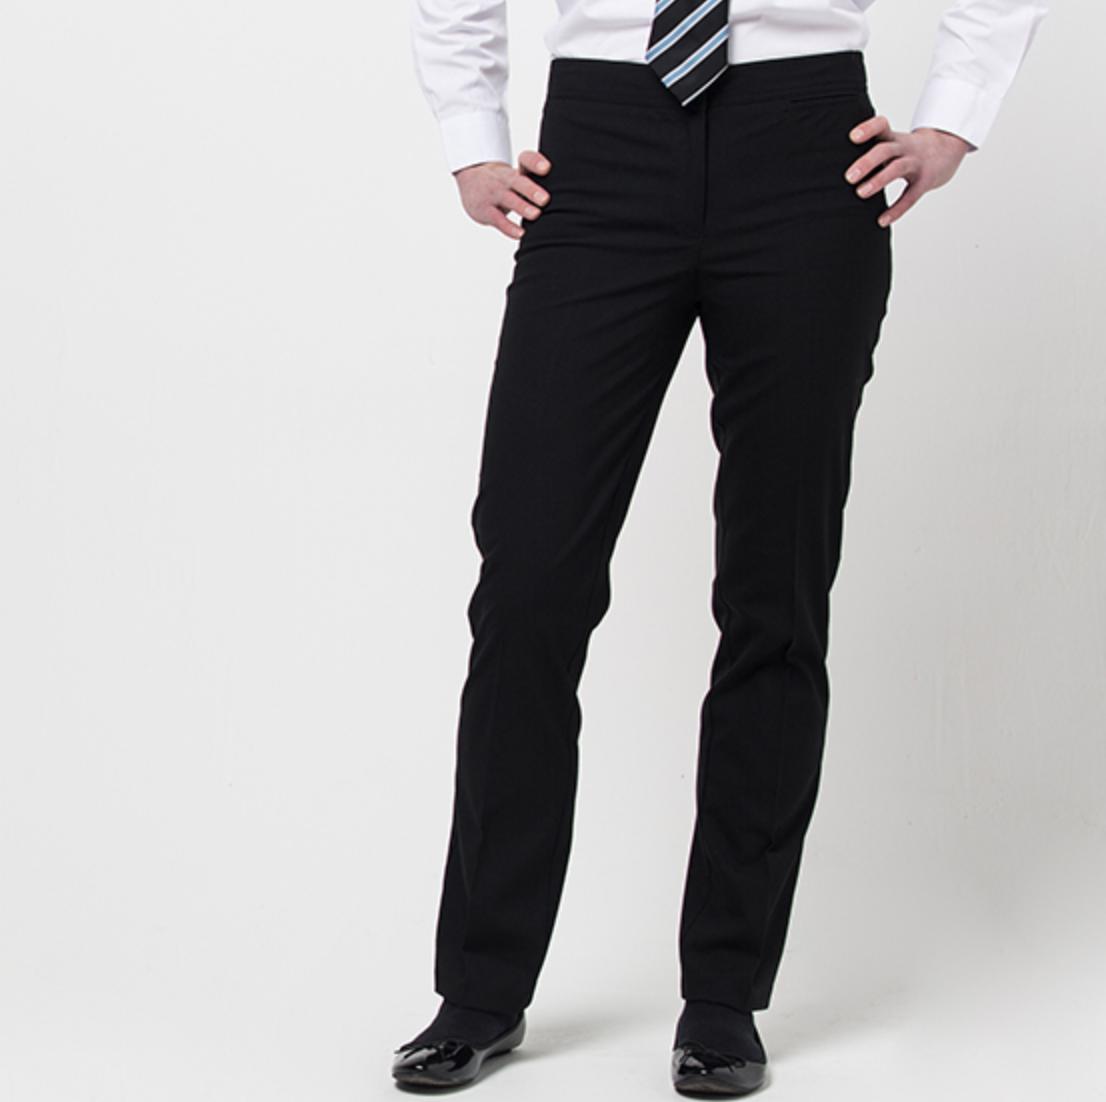 David Luke Girls' Black Trousers